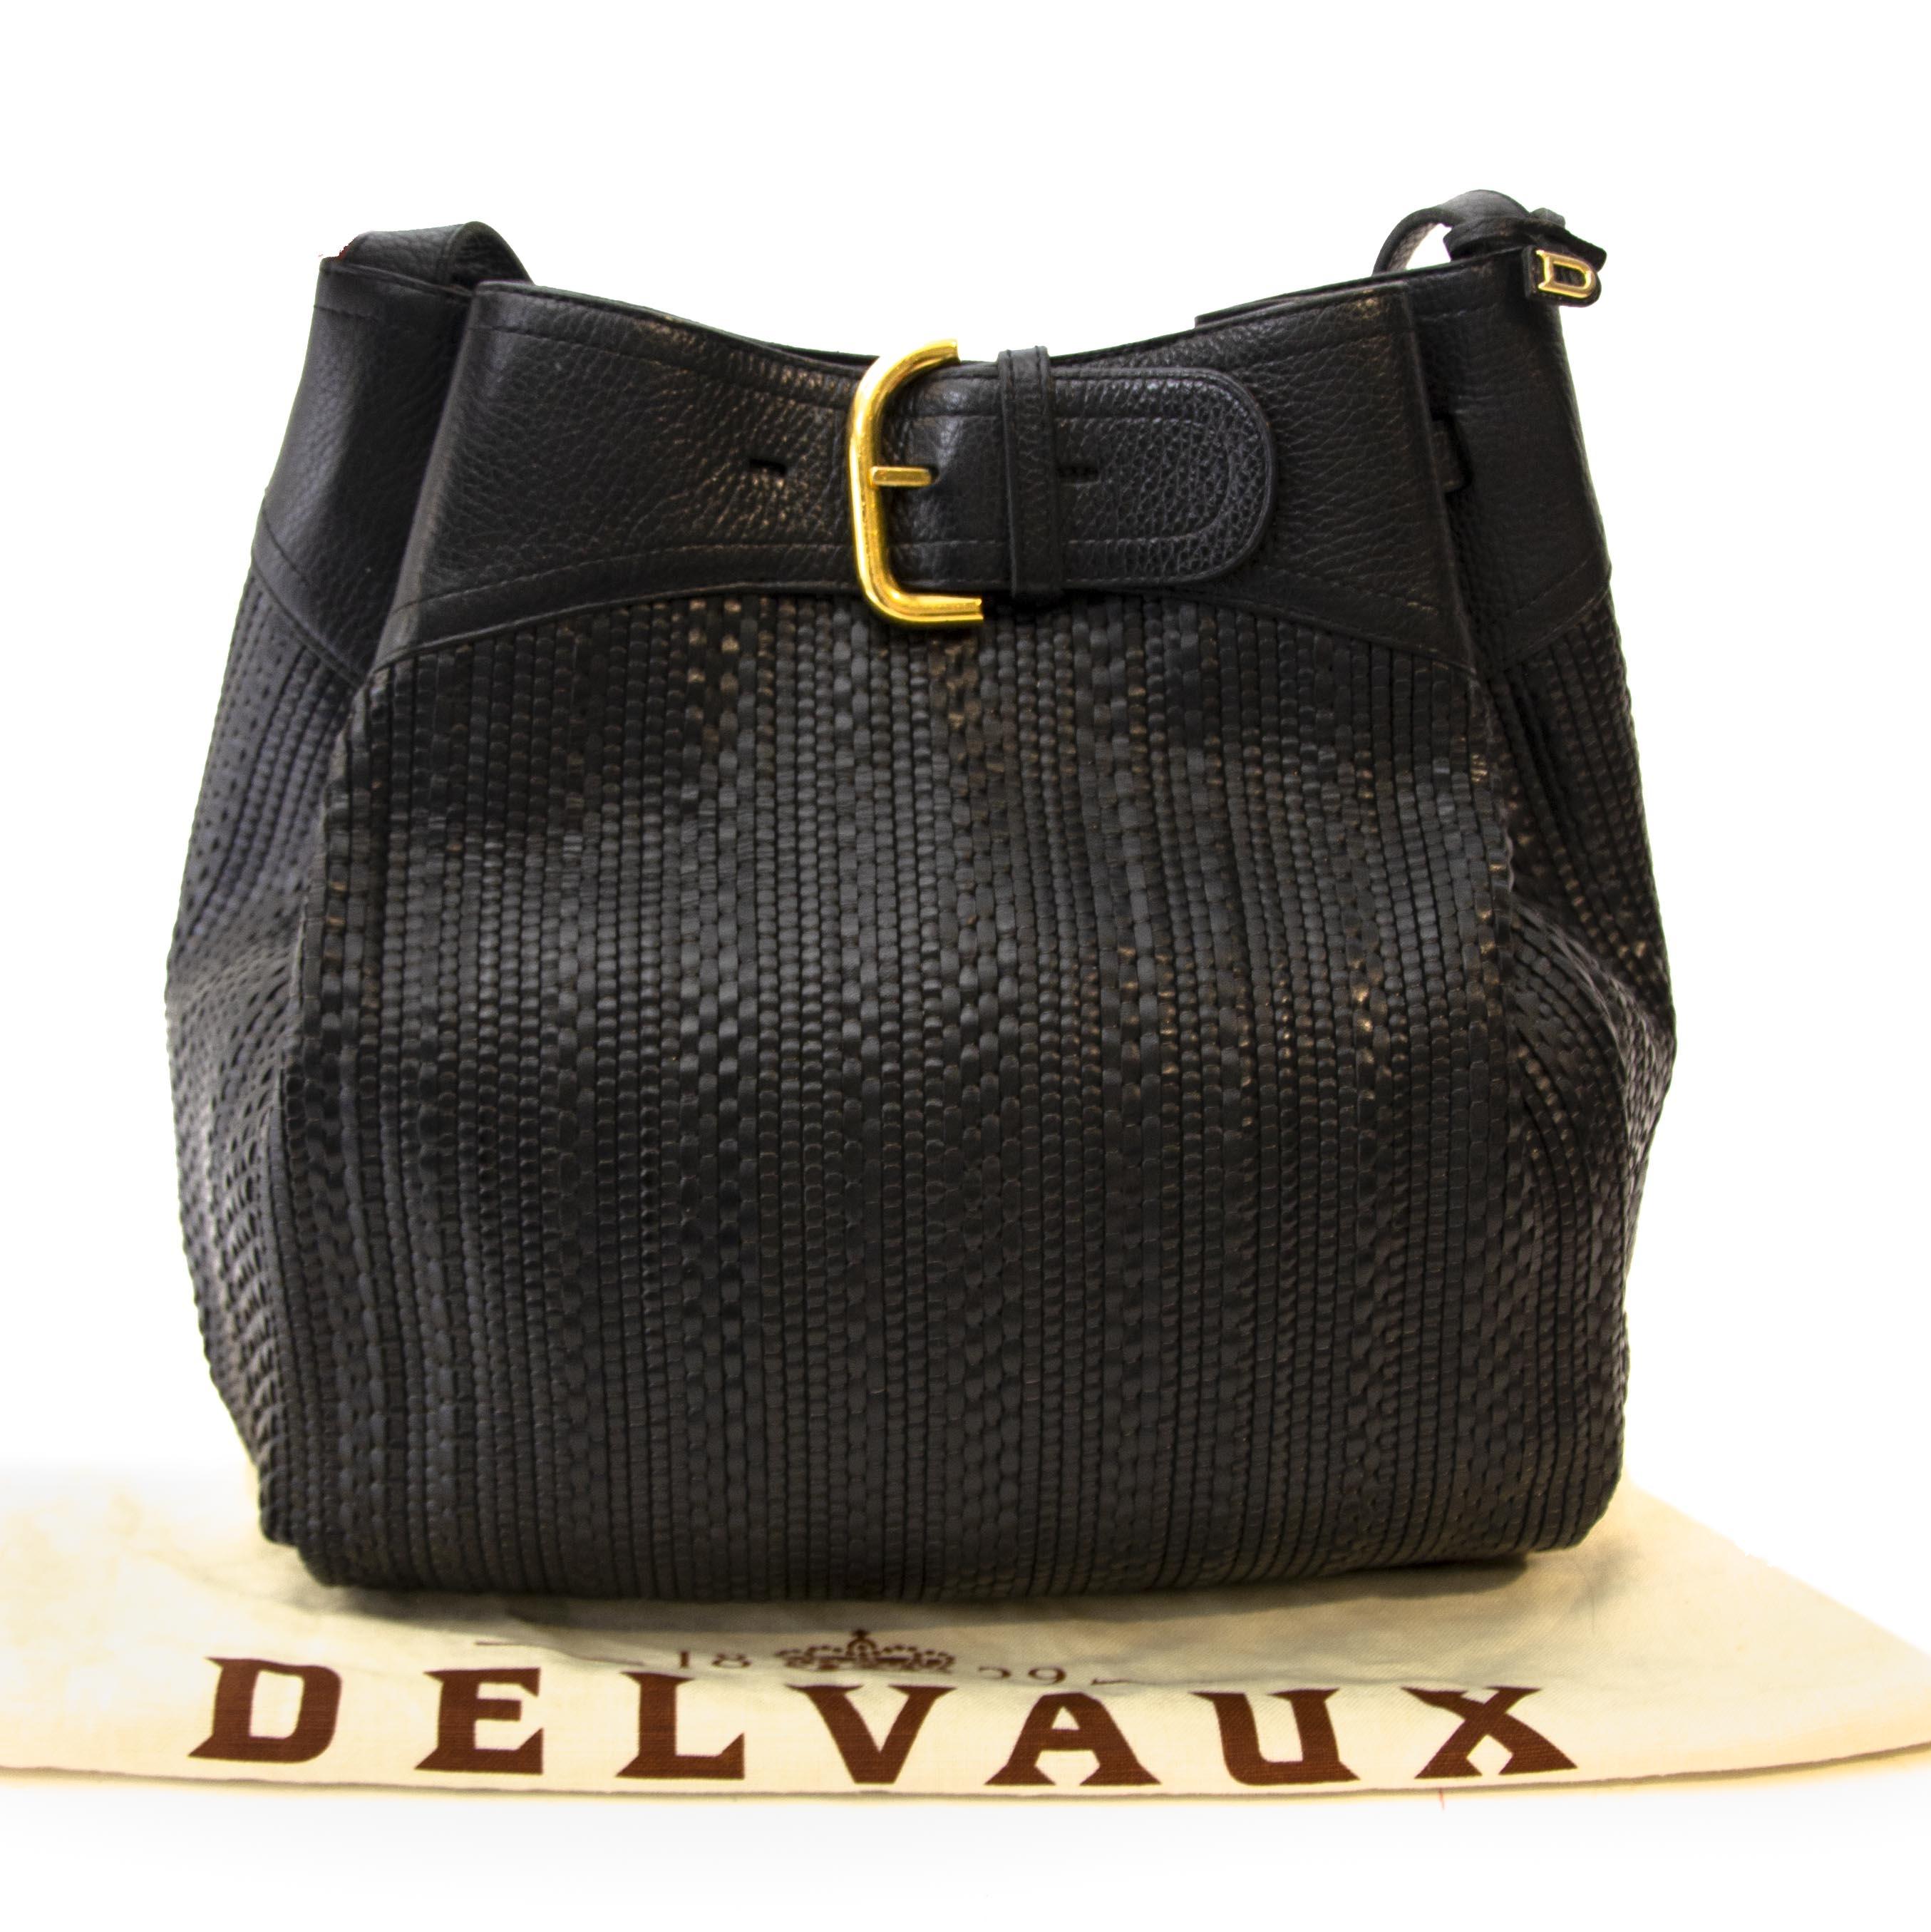 095fb8d3b560 Antwerp Online webshop Vintage Delvaux Toile de cuir bag at Labellov.  Webshop with designer handbags